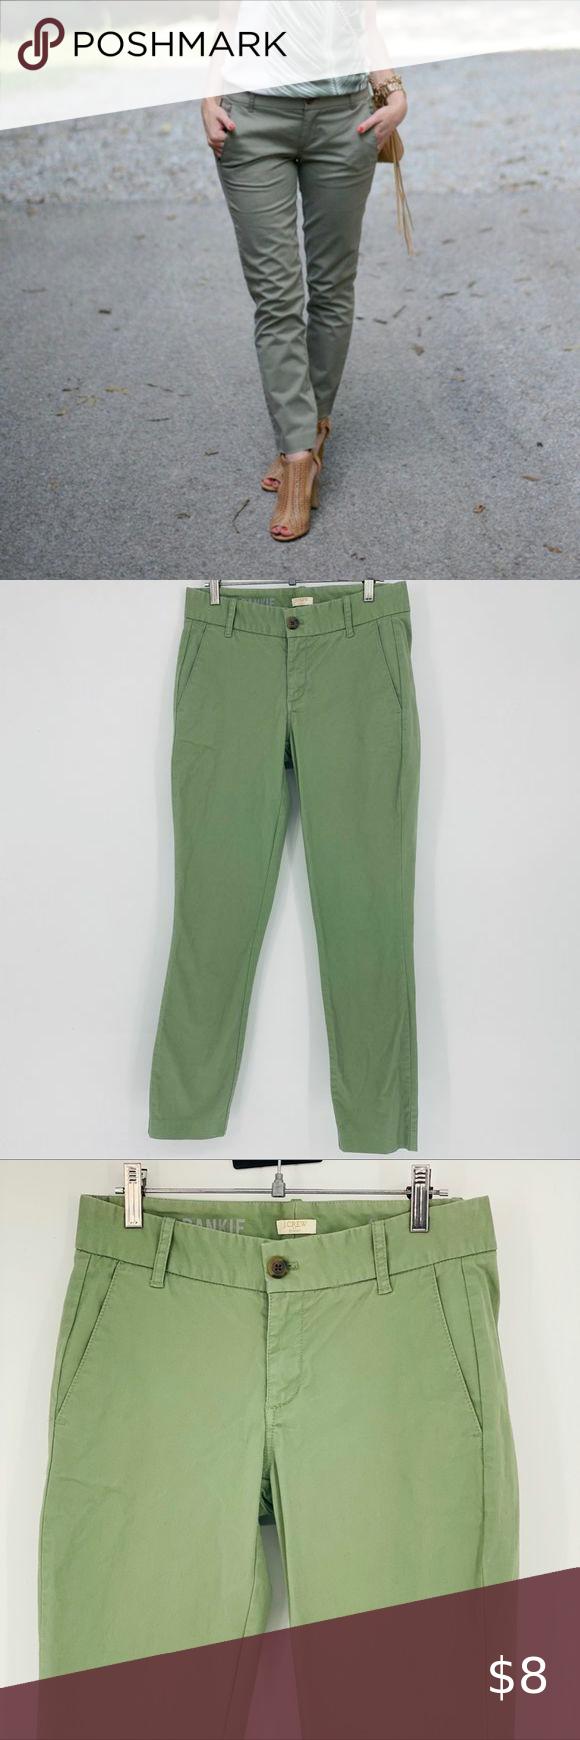 J.Crew Frankie skinny chino pants sage J.Crew Frankie skinny chino pants sage Sz.00 Excellent used c